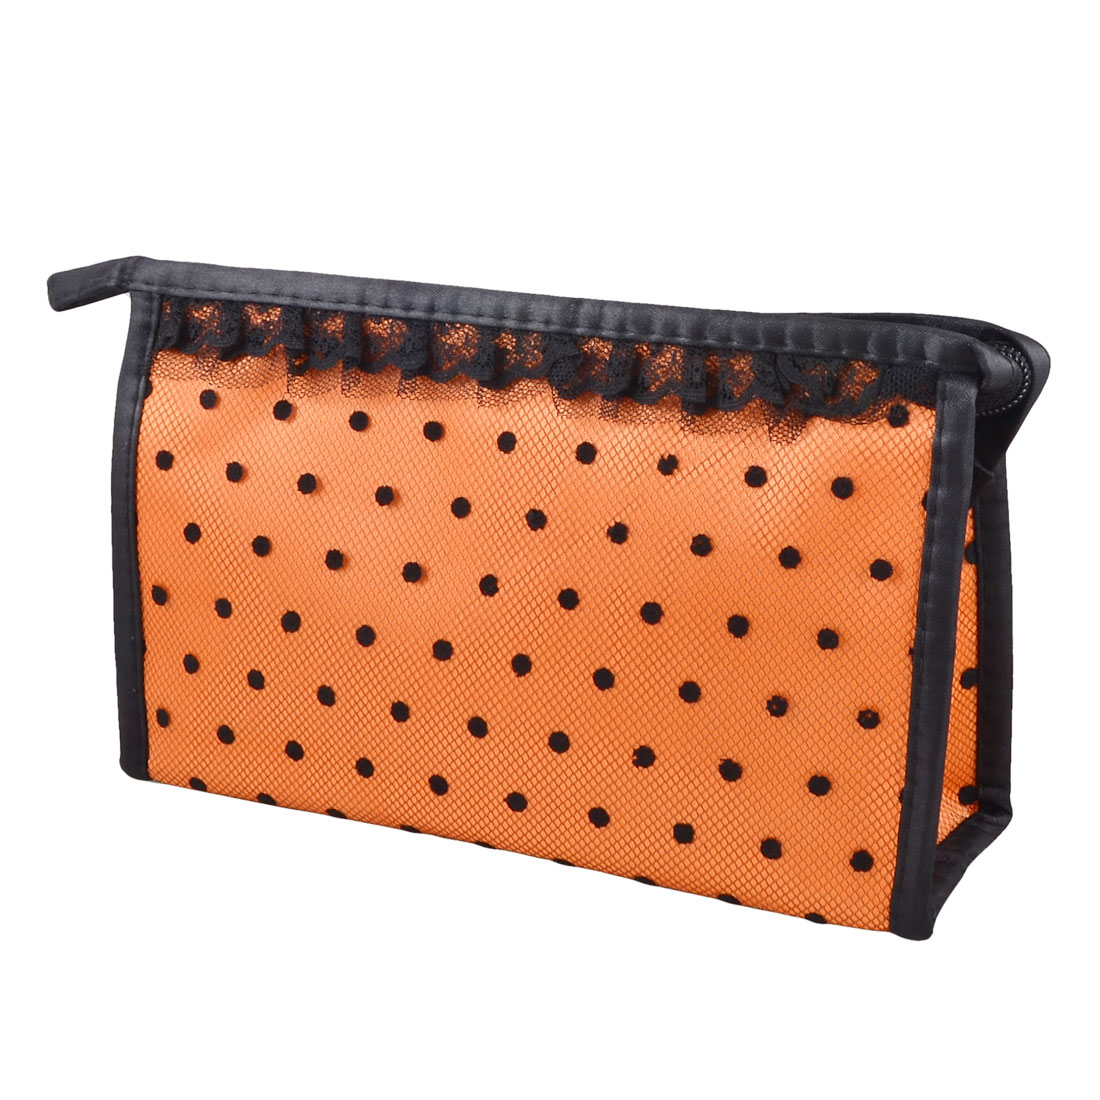 Orange Black Lace Dots Mesh Mirror Makeup Cosmetic Hand Bag Case Holder Organizer